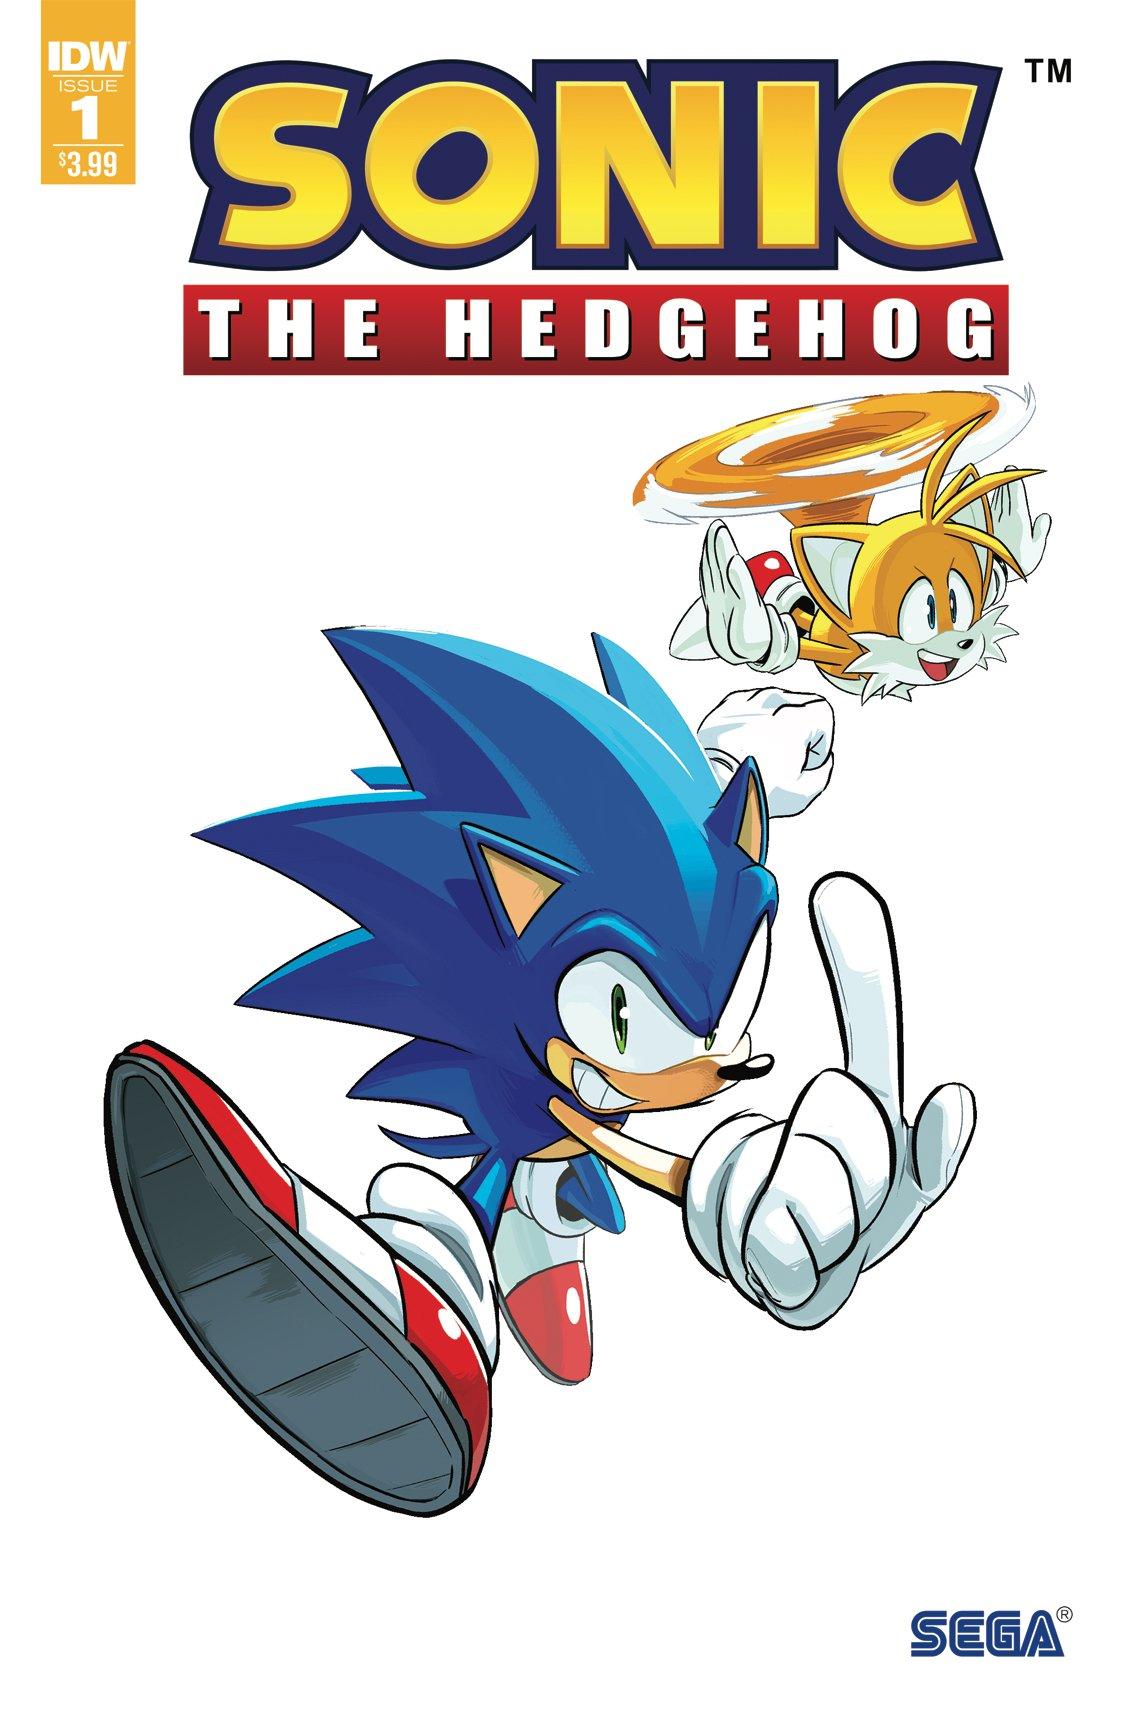 Sonic the Hedgehog 001 (April 2018) (3rd printing)